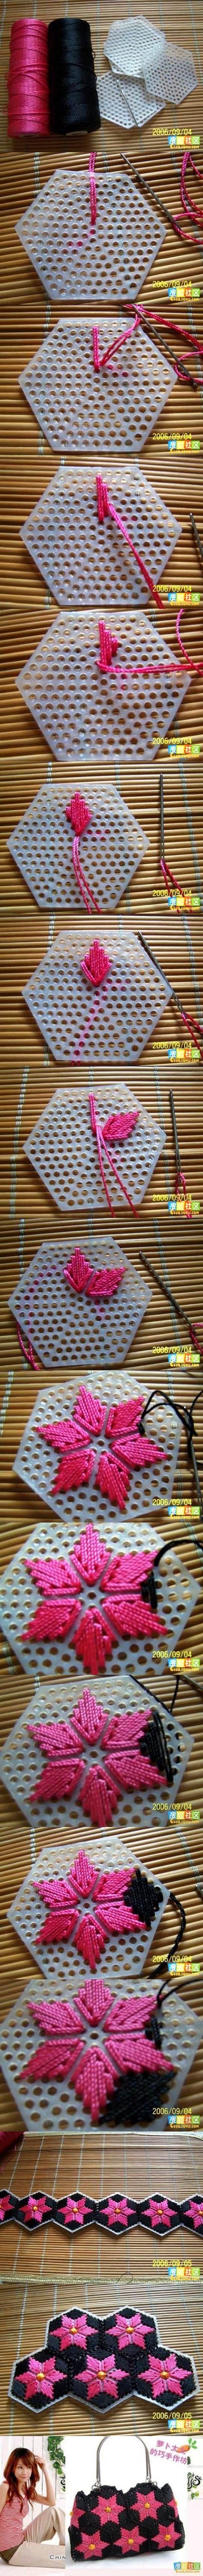 DIY Pretty Handbag from Stitch on Plastic Canvas | iCreativeIdeas.com Like Us on Facebook ==> https://www.facebook.com/icreativeideas